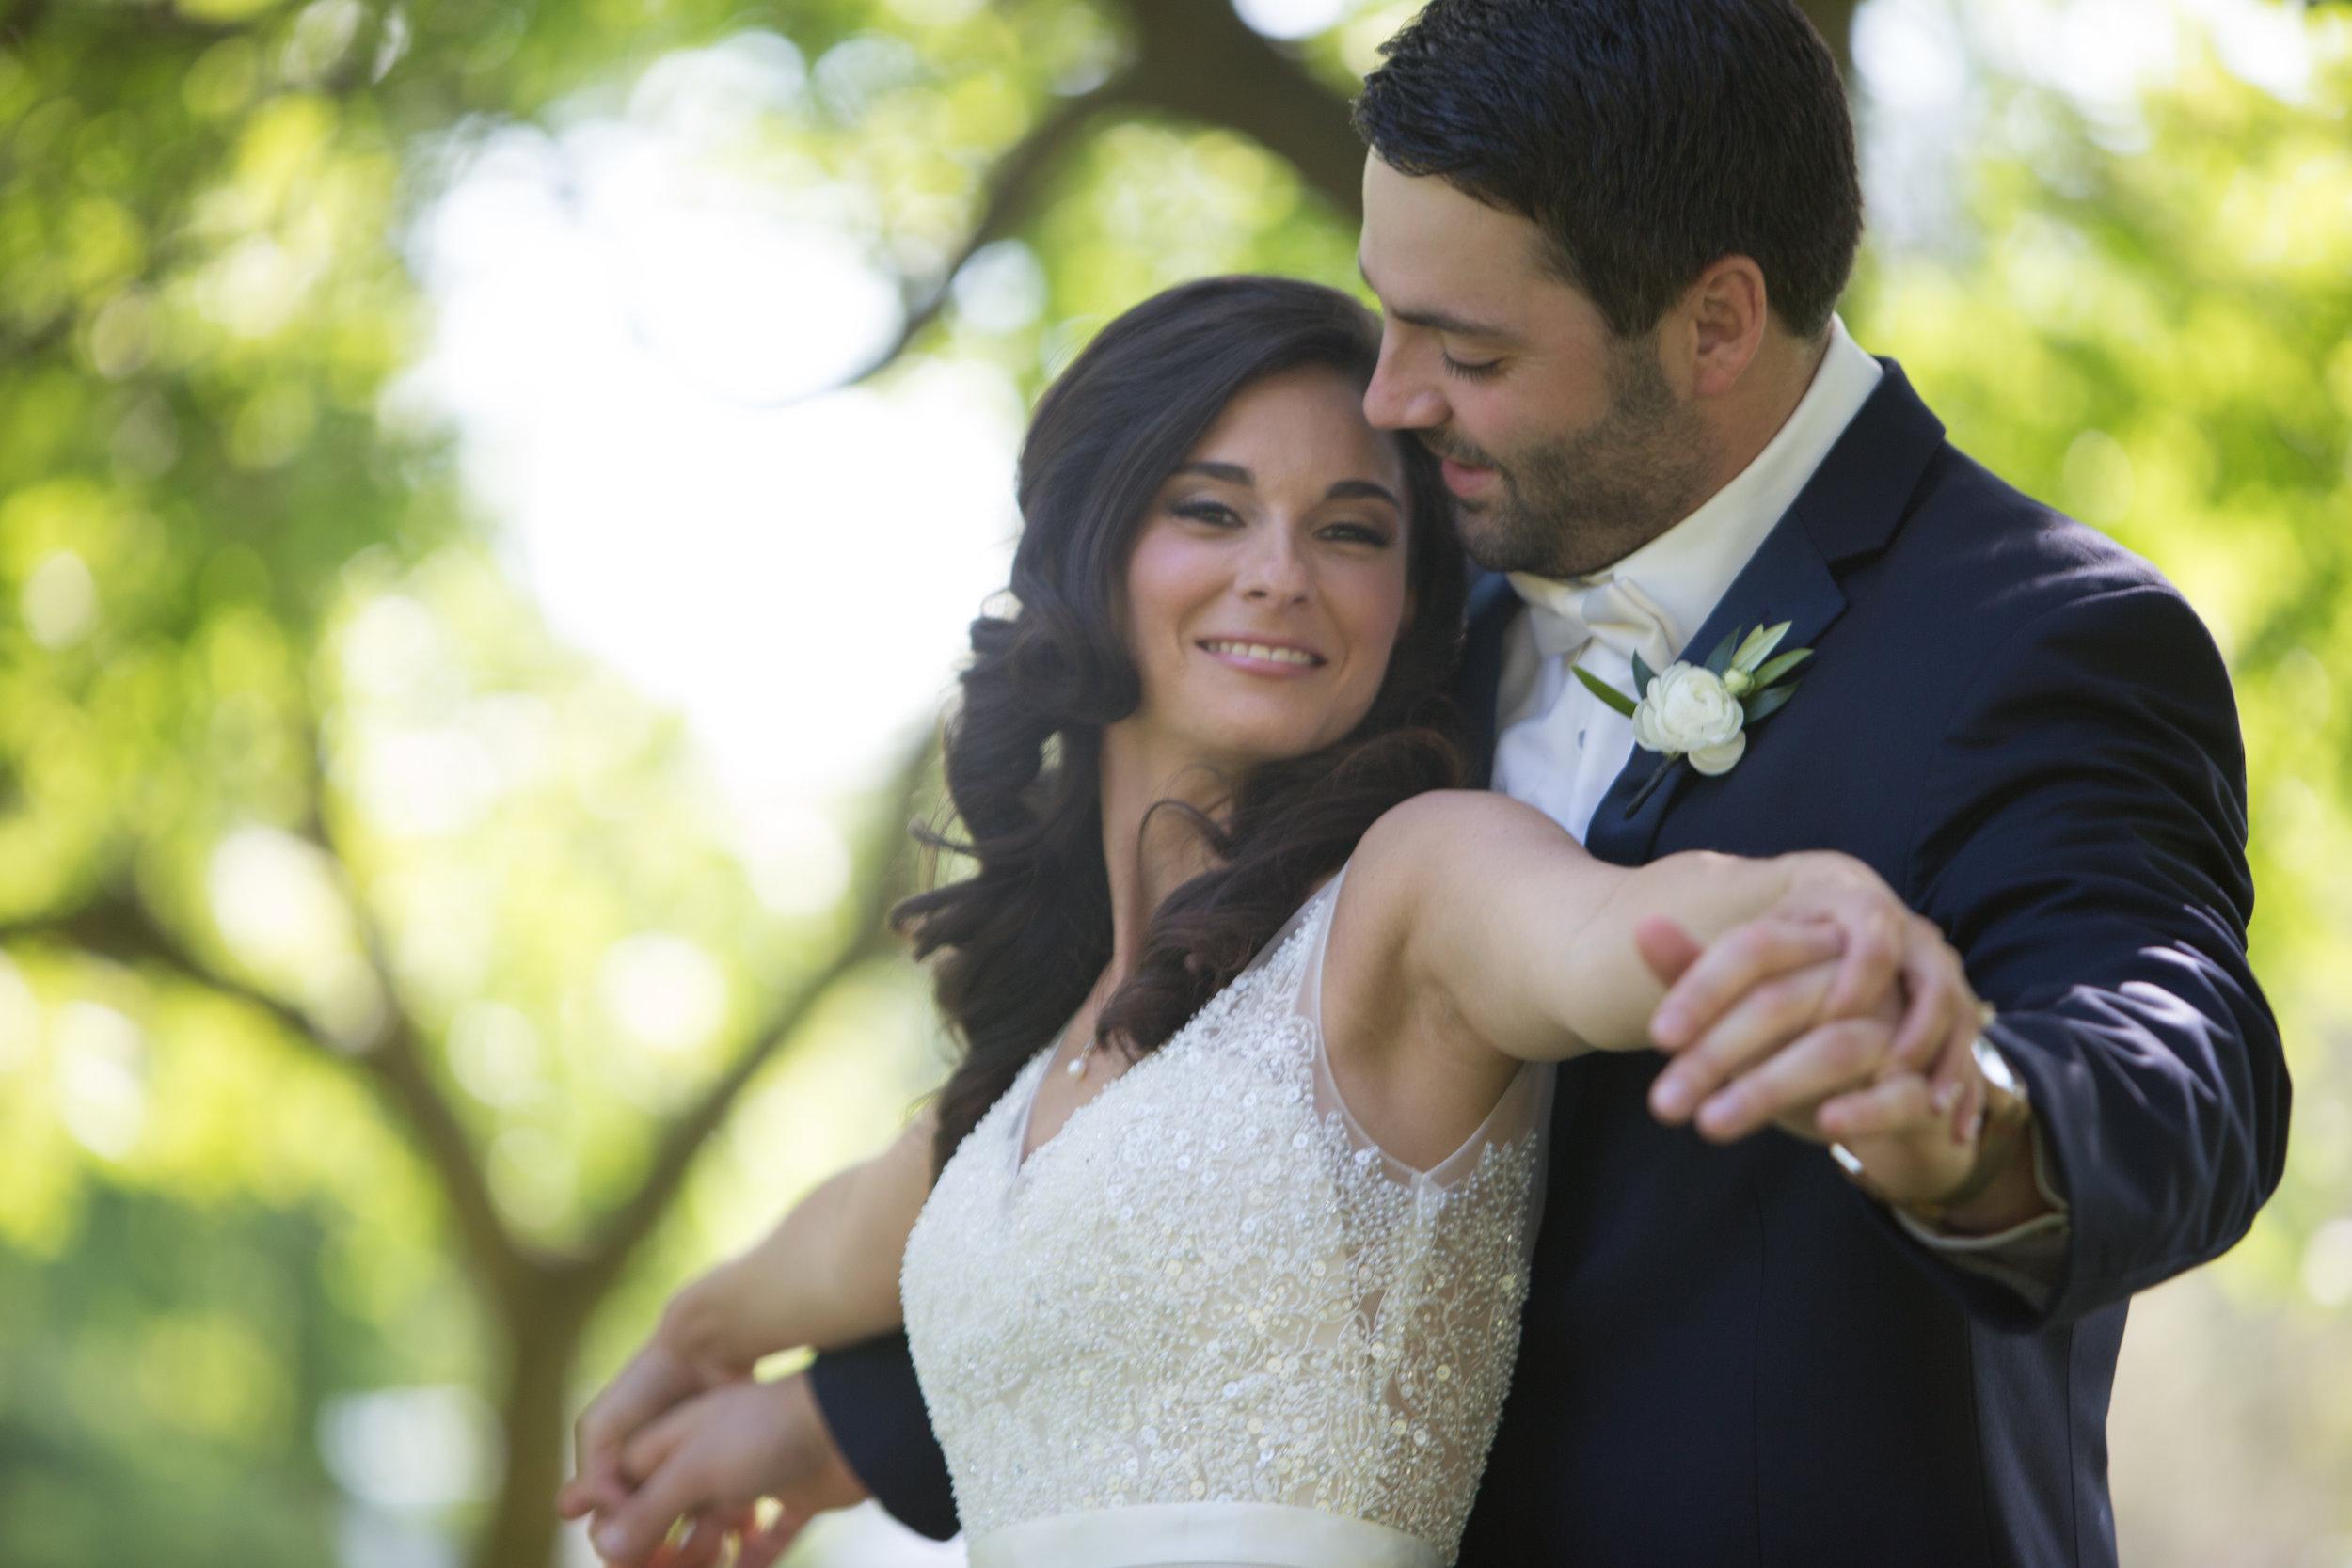 St. Louis Photographer St. Charles Photographer Engagement Wedding Photographer (48).jpg